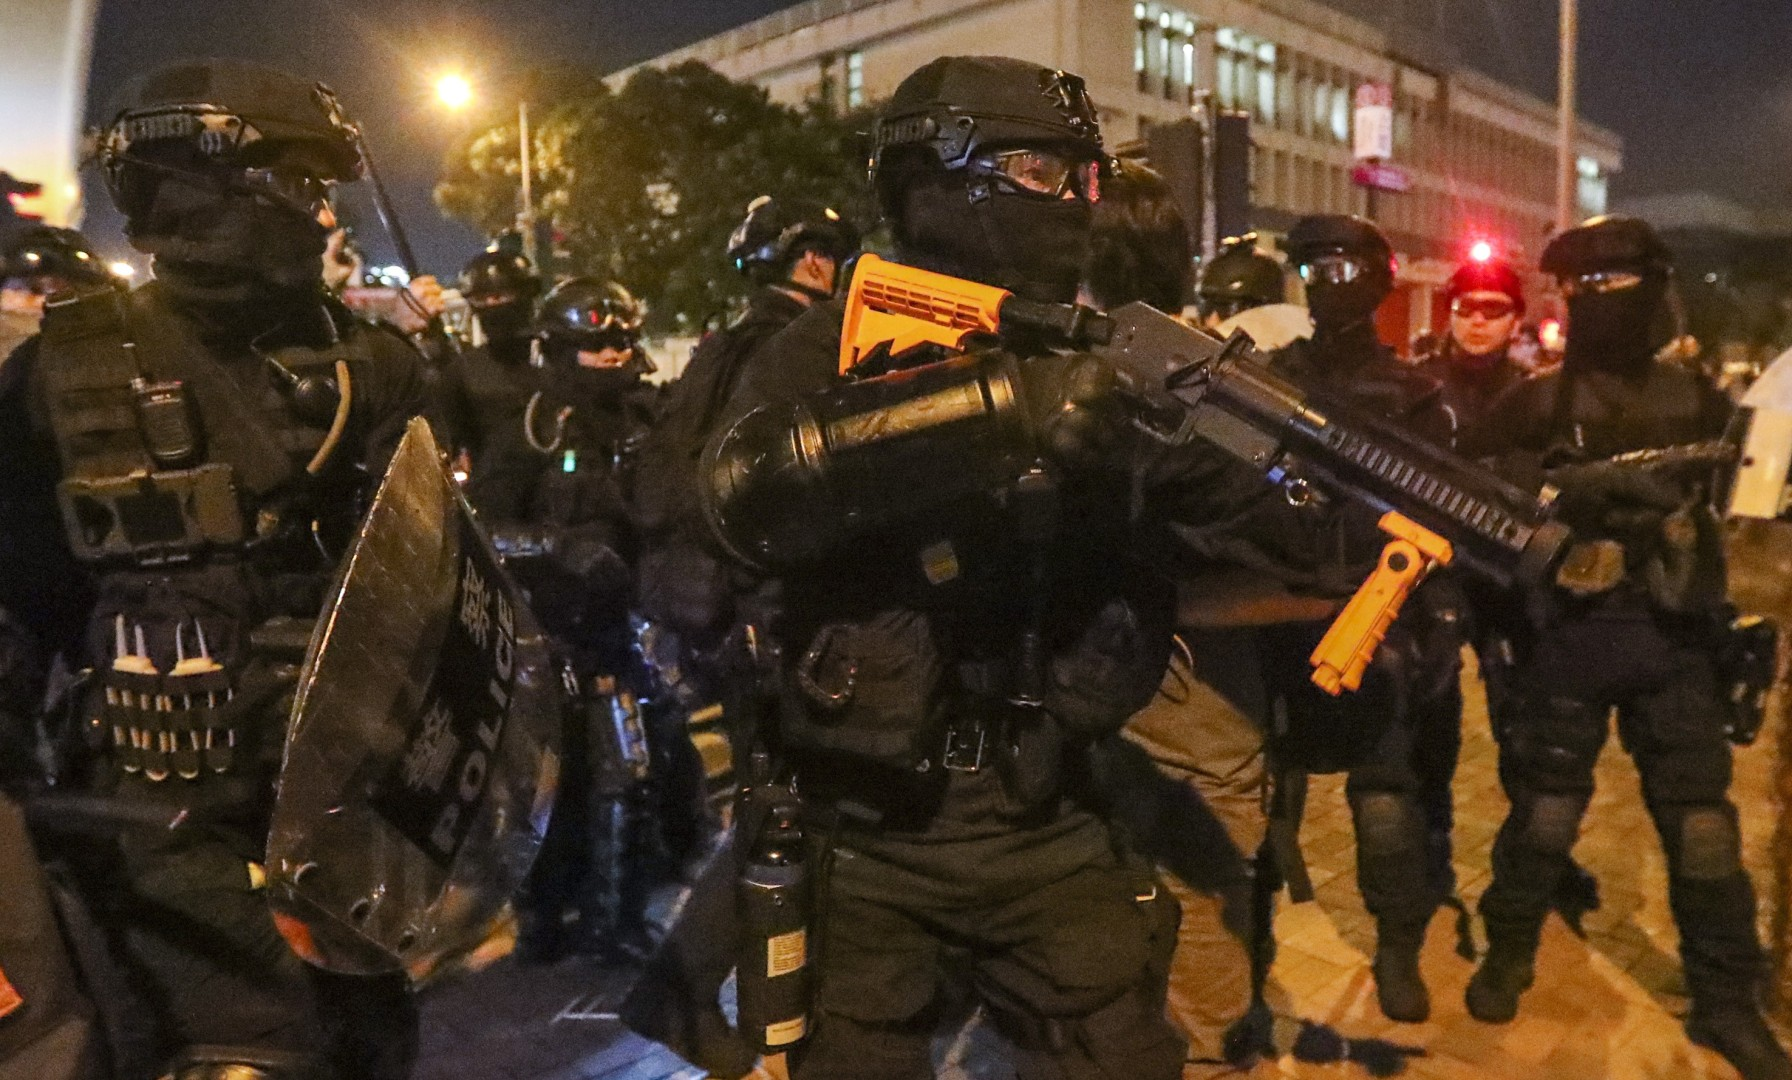 Hong Kong police confirm use of sponge grenades, rubber